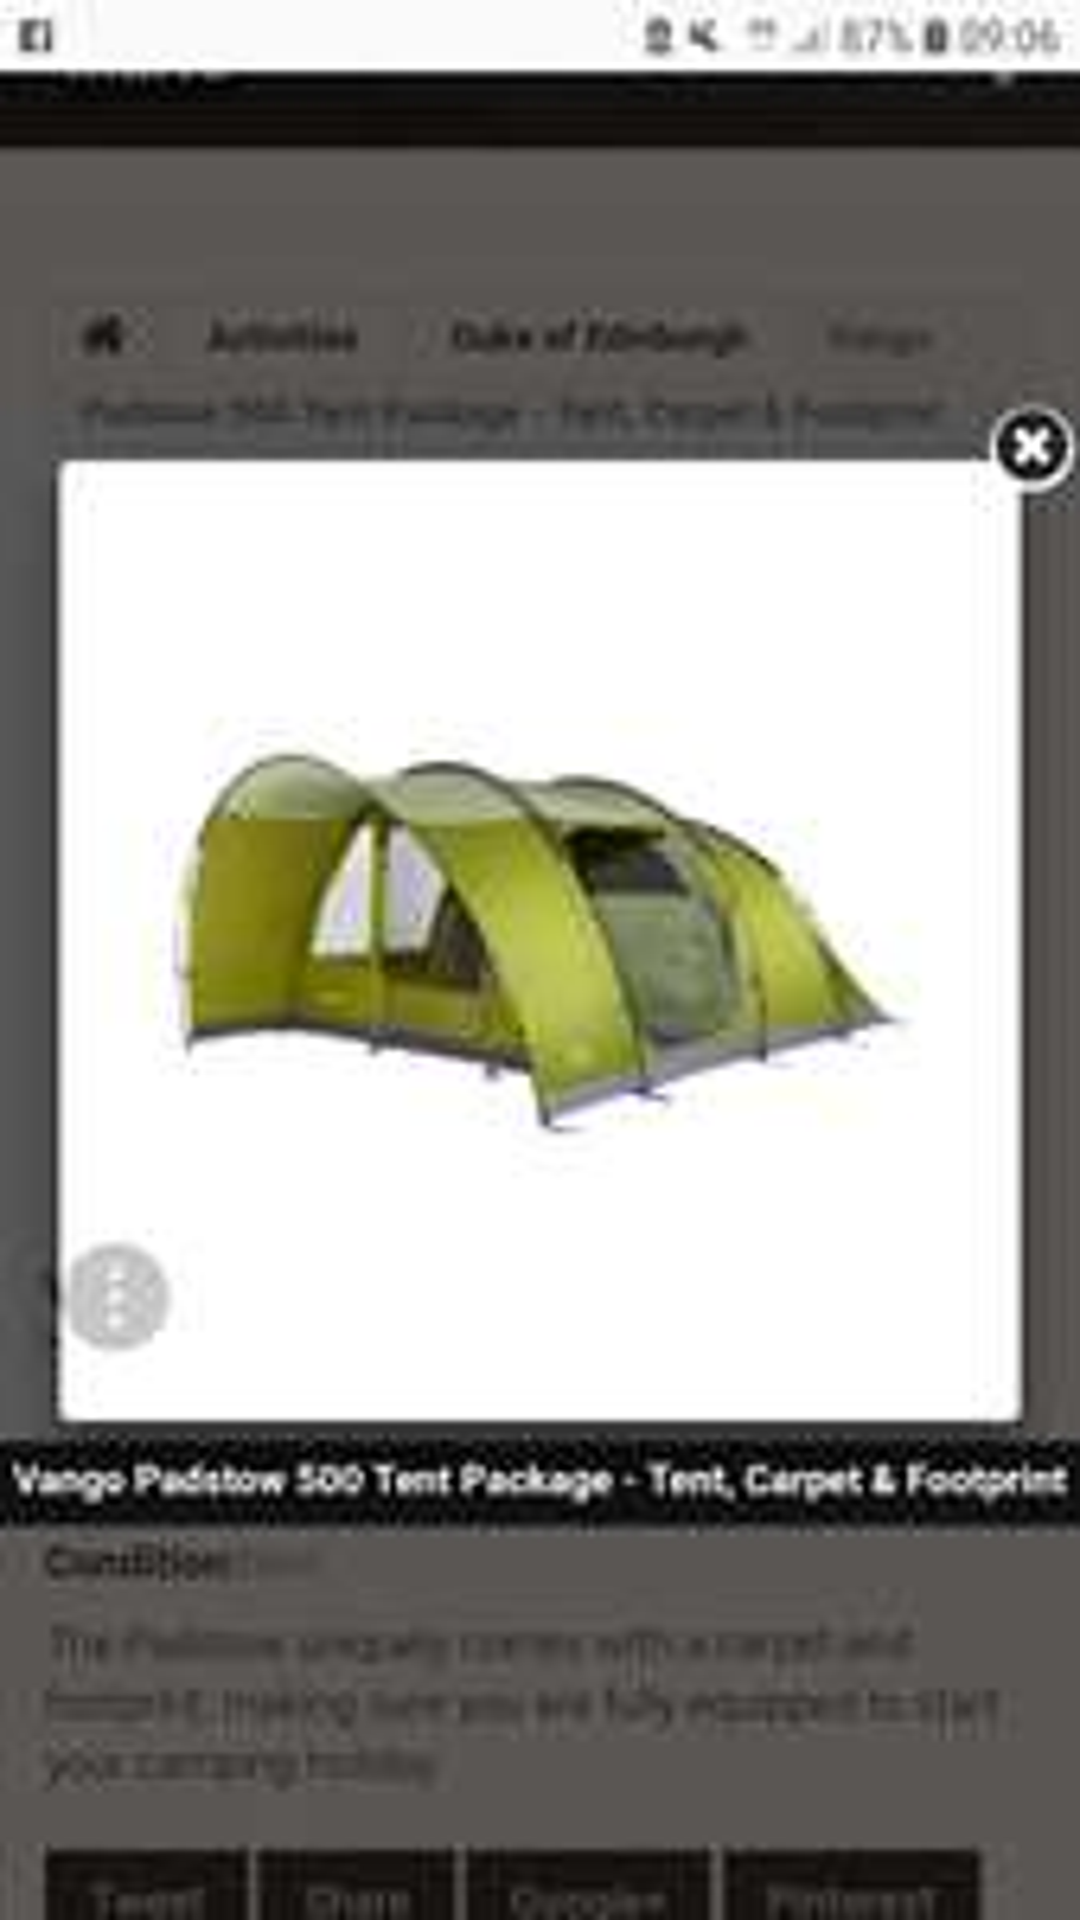 Vango padstow tent package £249.99 summitsonline / Ebay